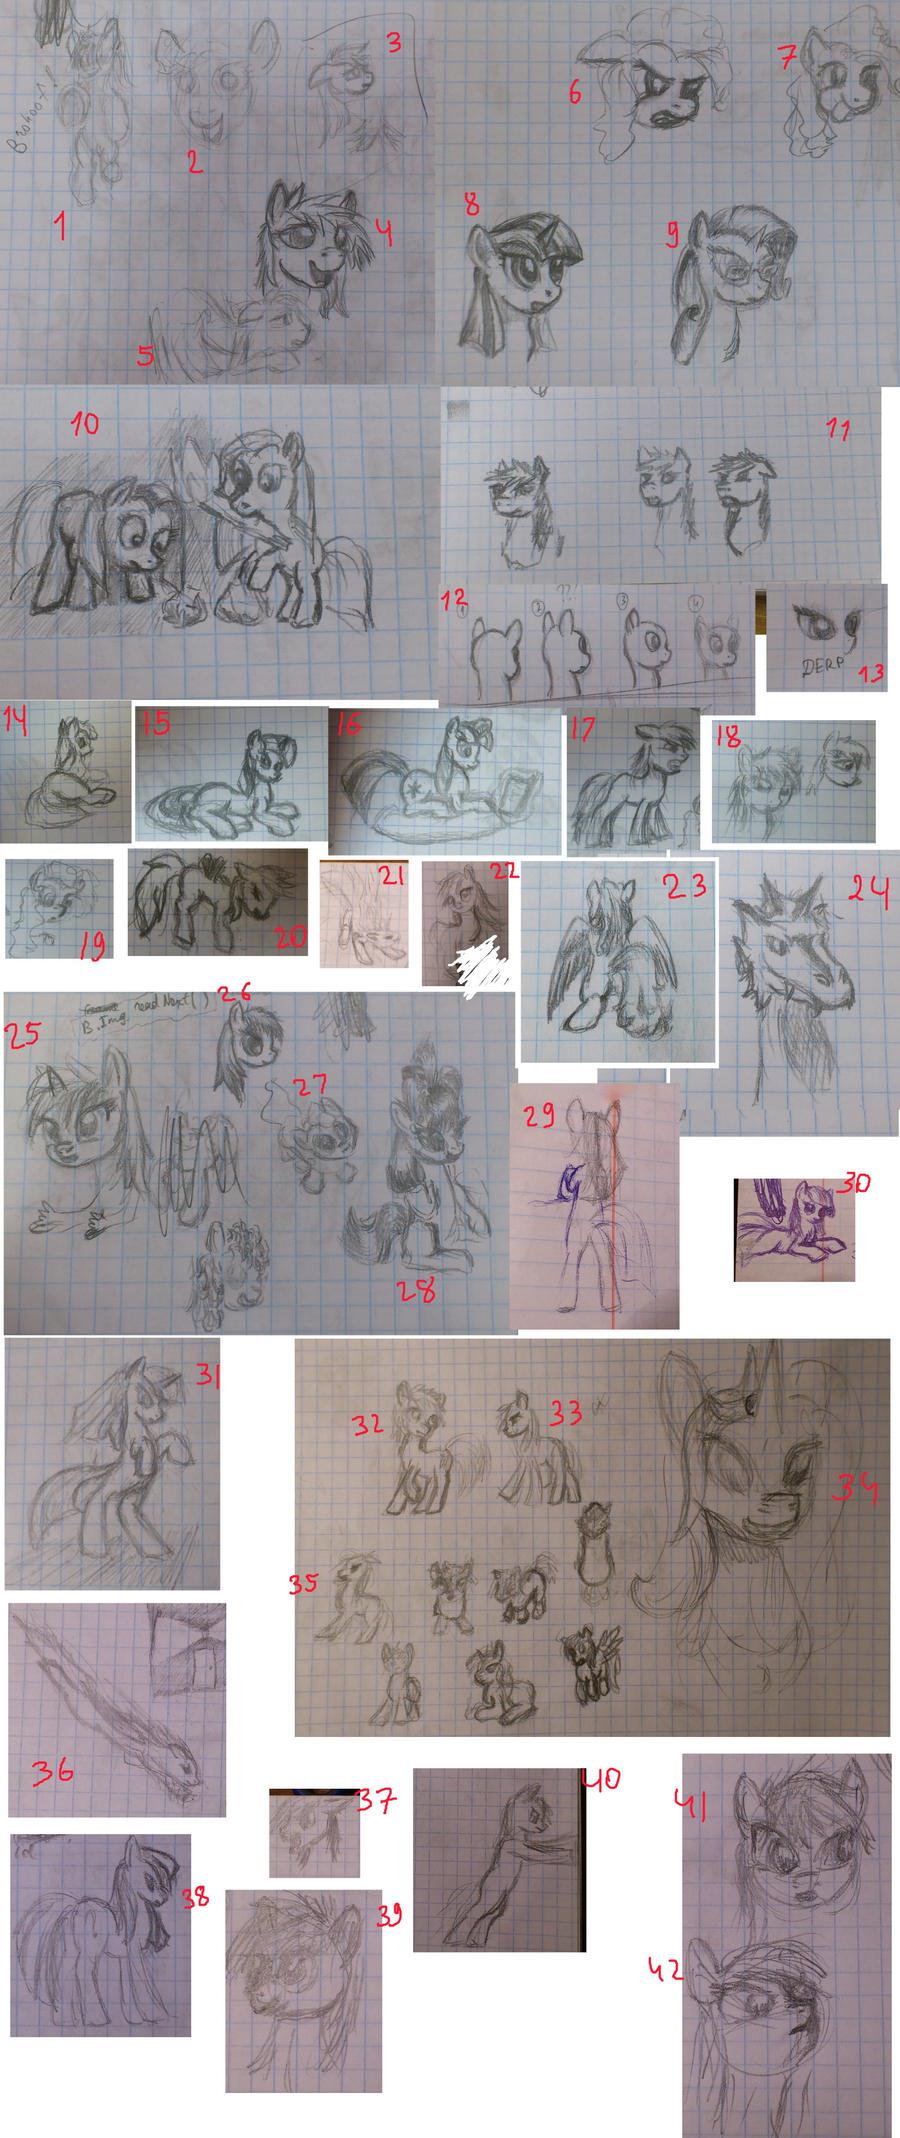 Sketchdump by Sokolas